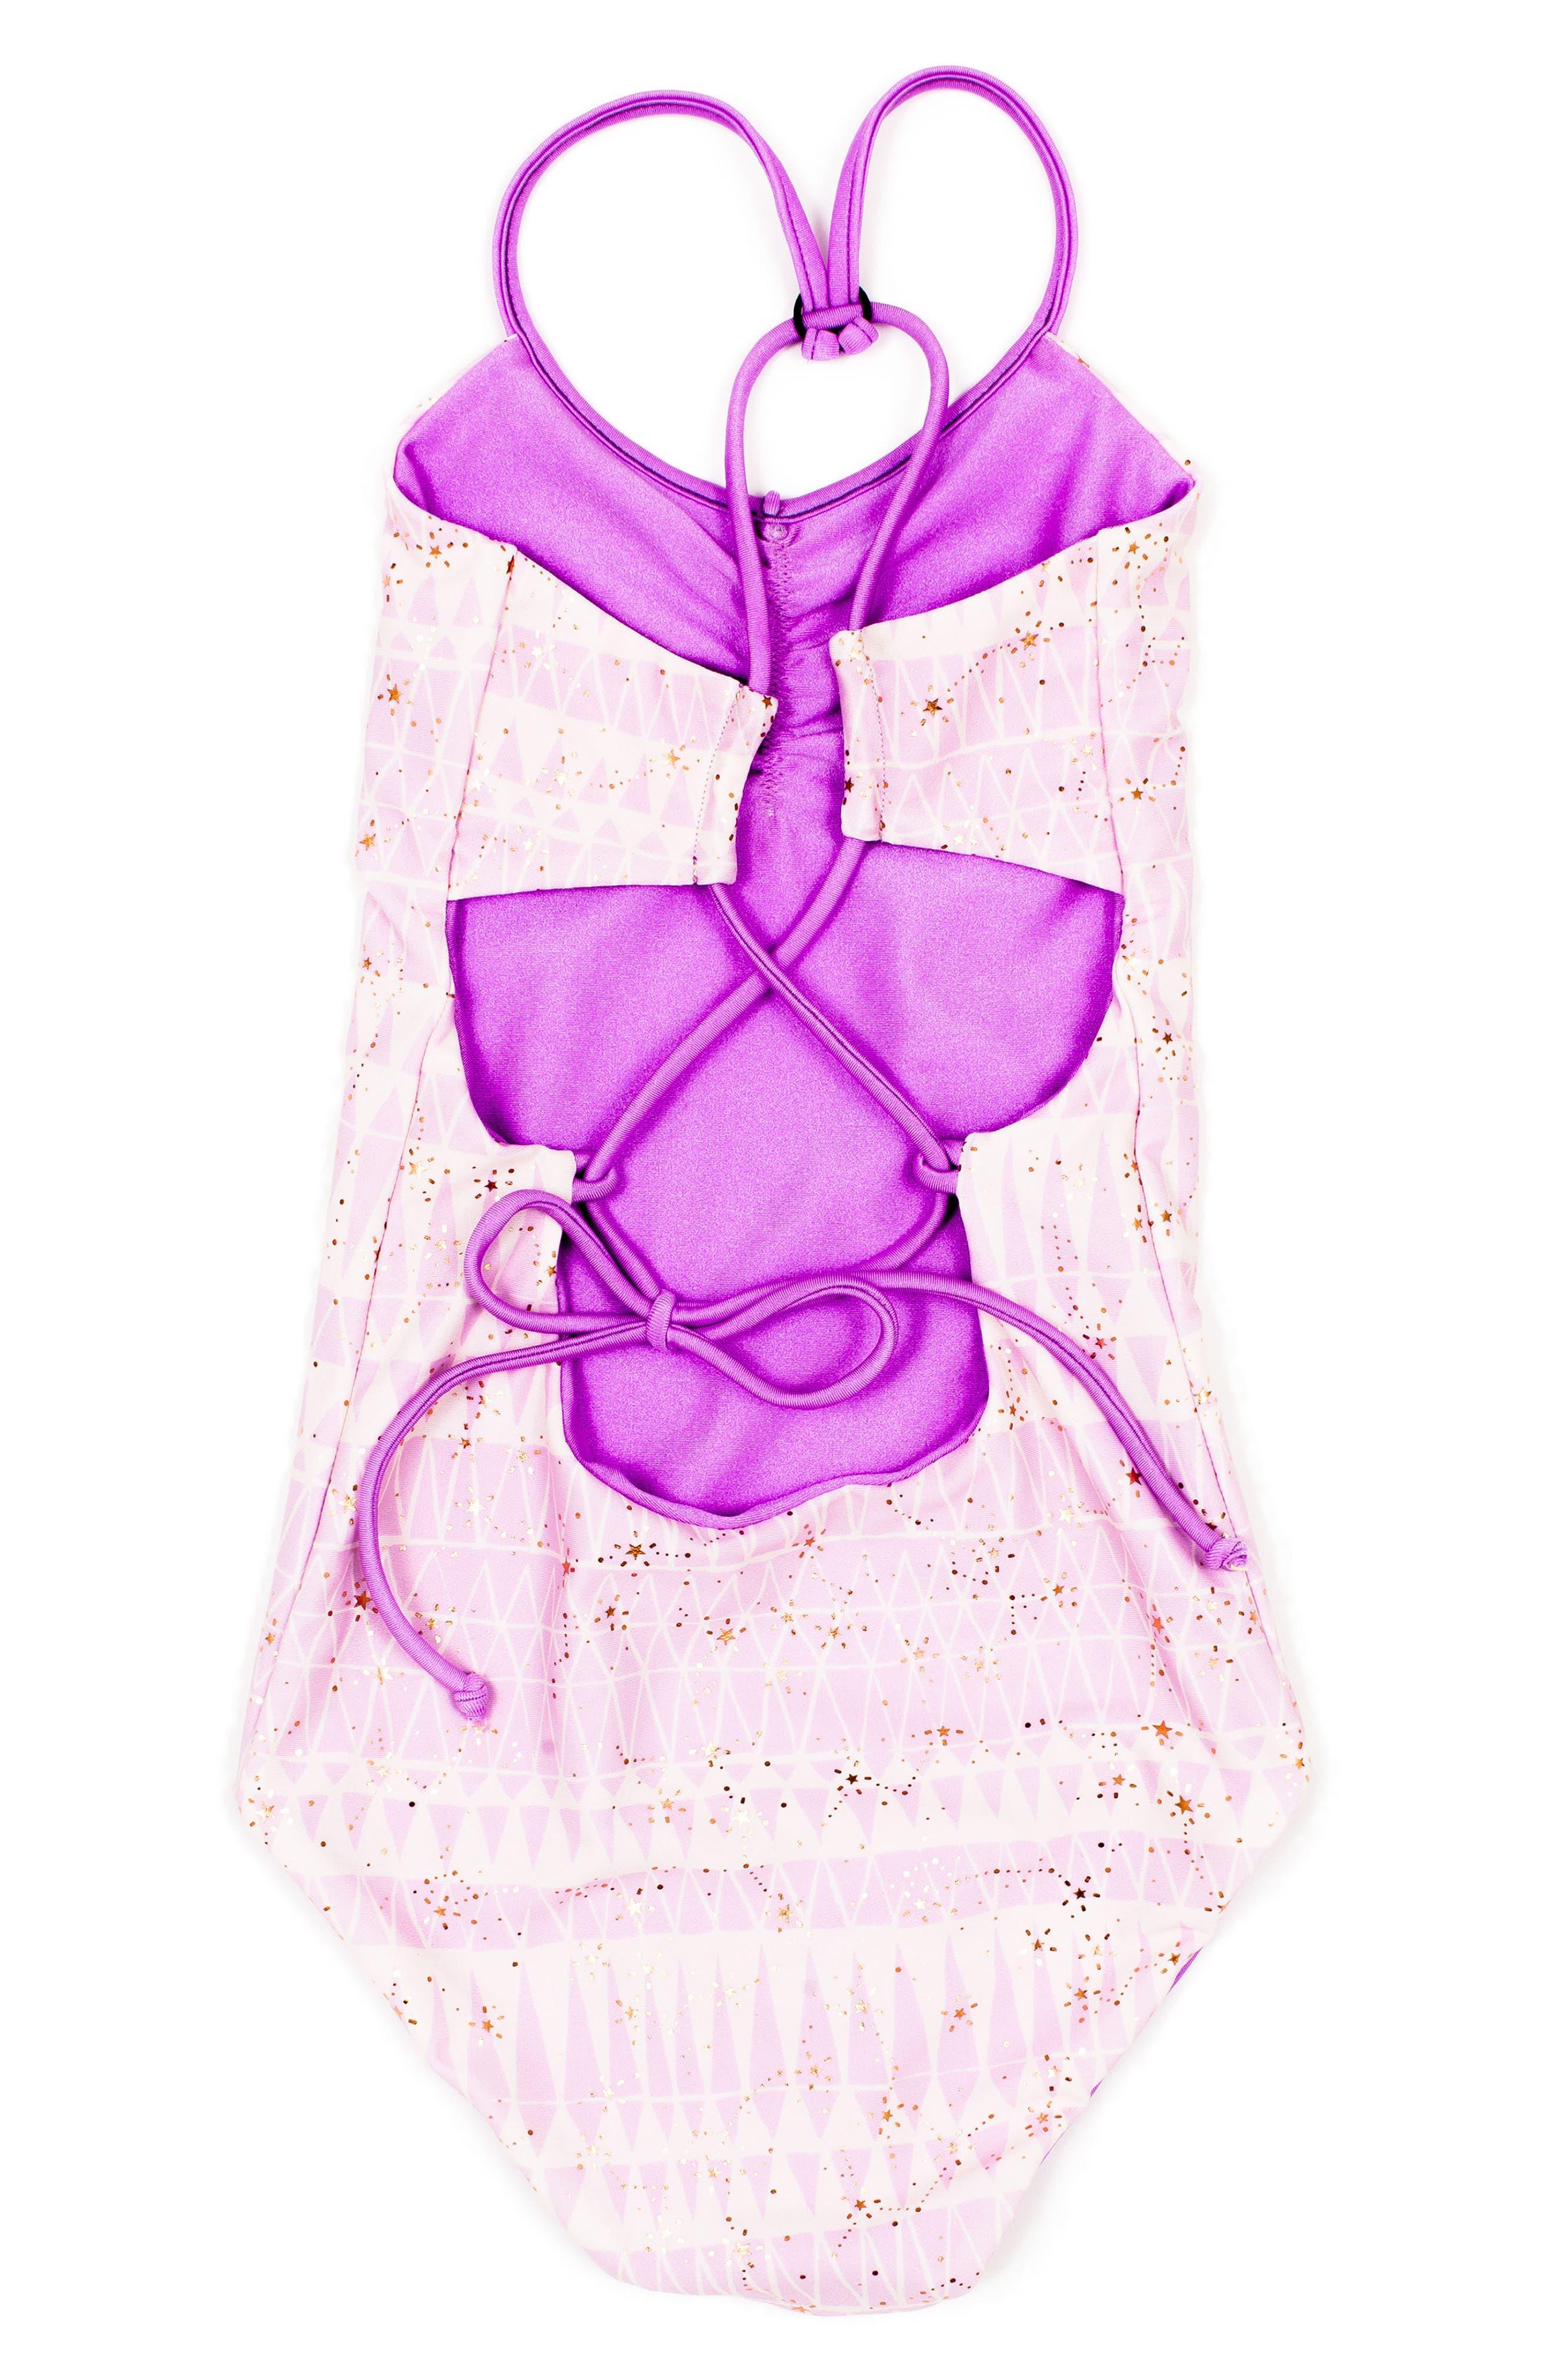 Catalinakini One-Piece Reversible Swimsuit,                             Alternate thumbnail 3, color,                             Lavender